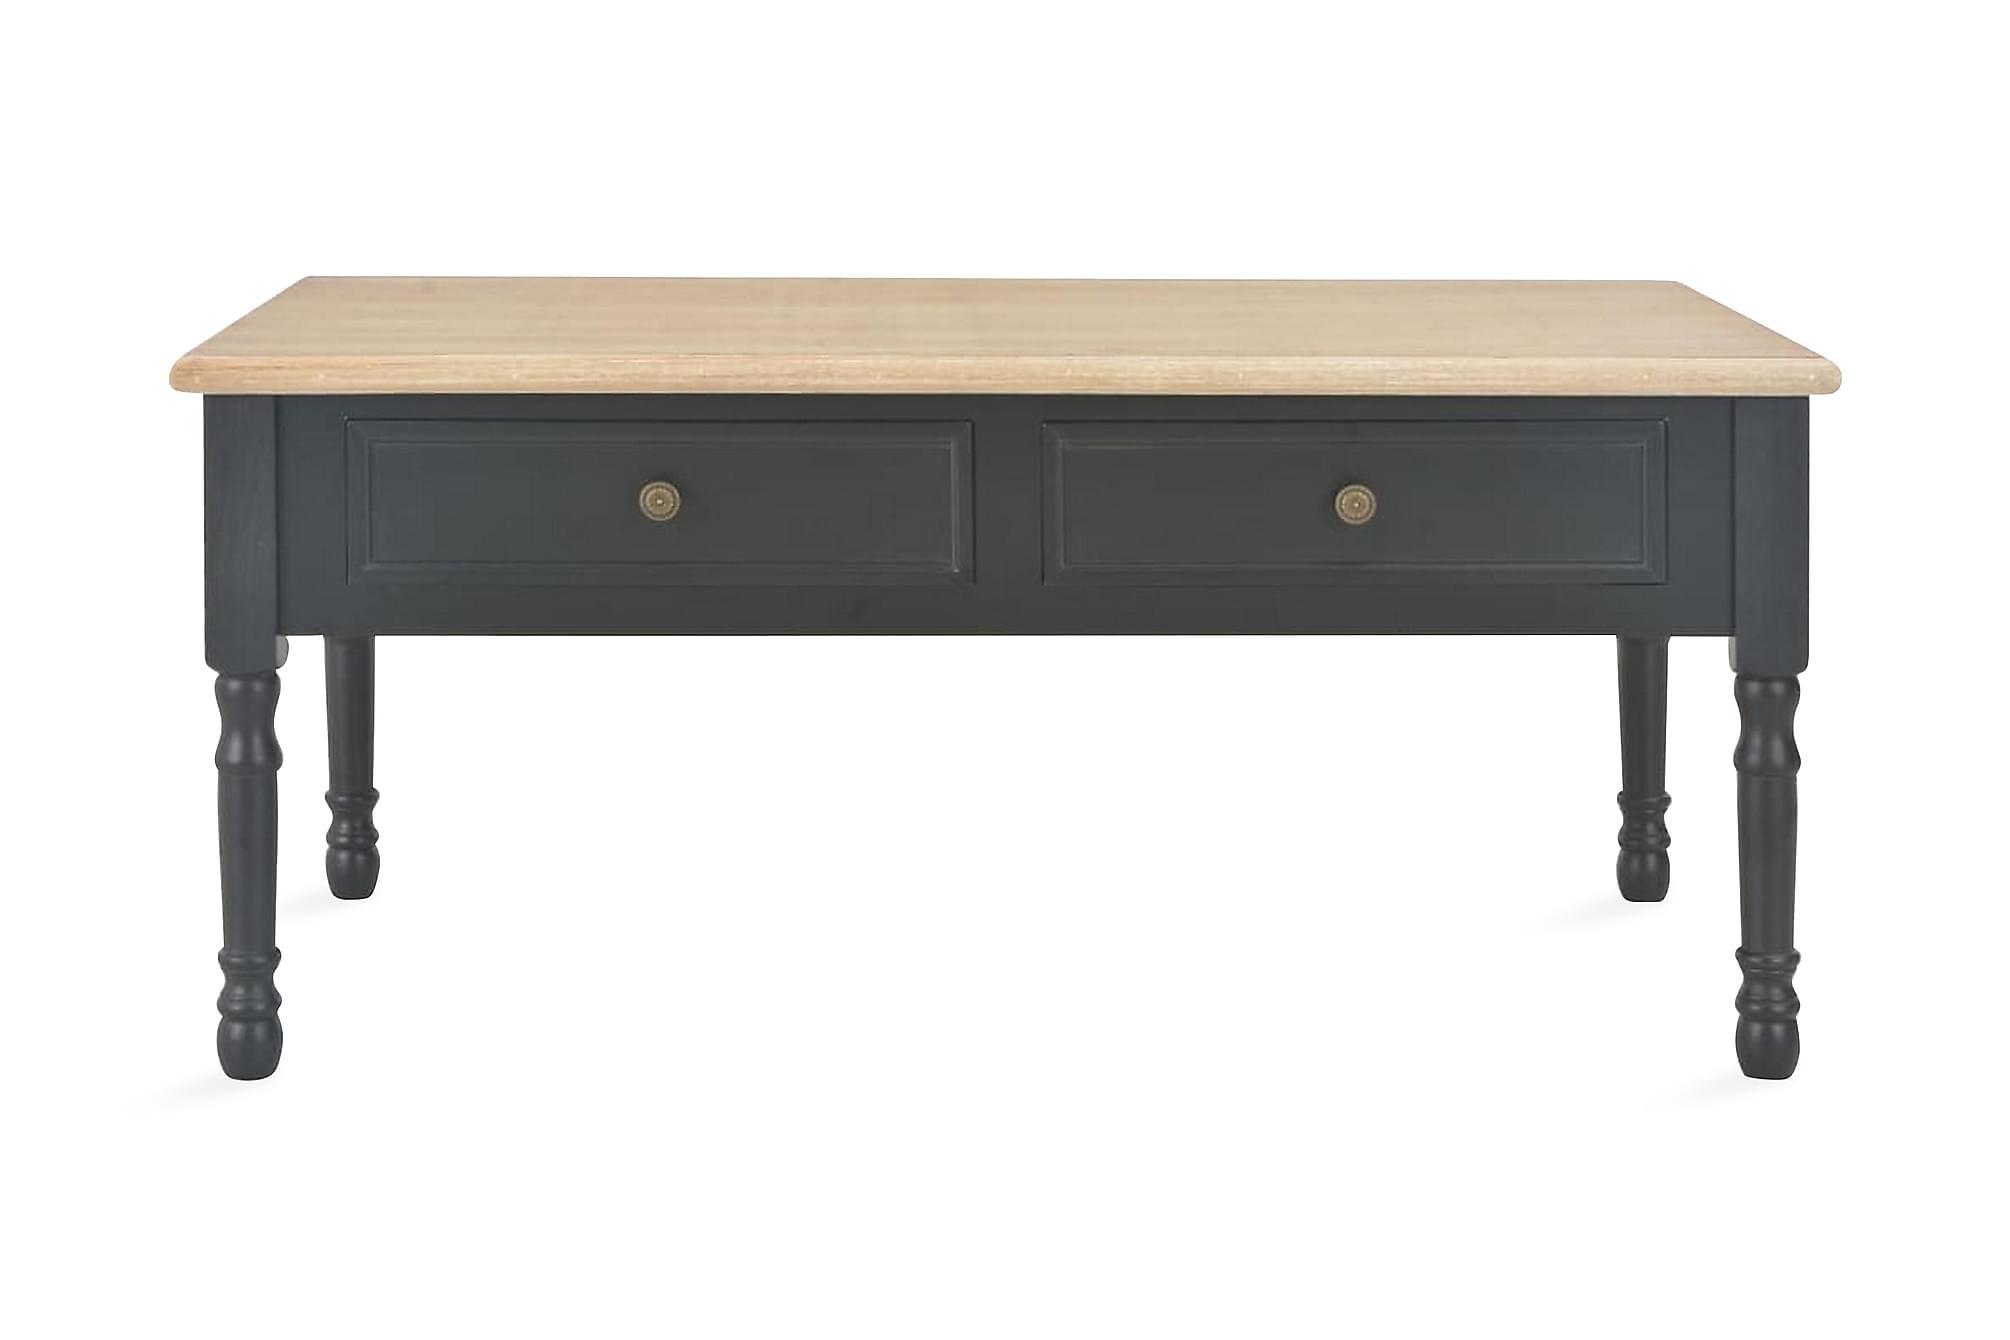 Soffbord svart 100x55x45 cm trä